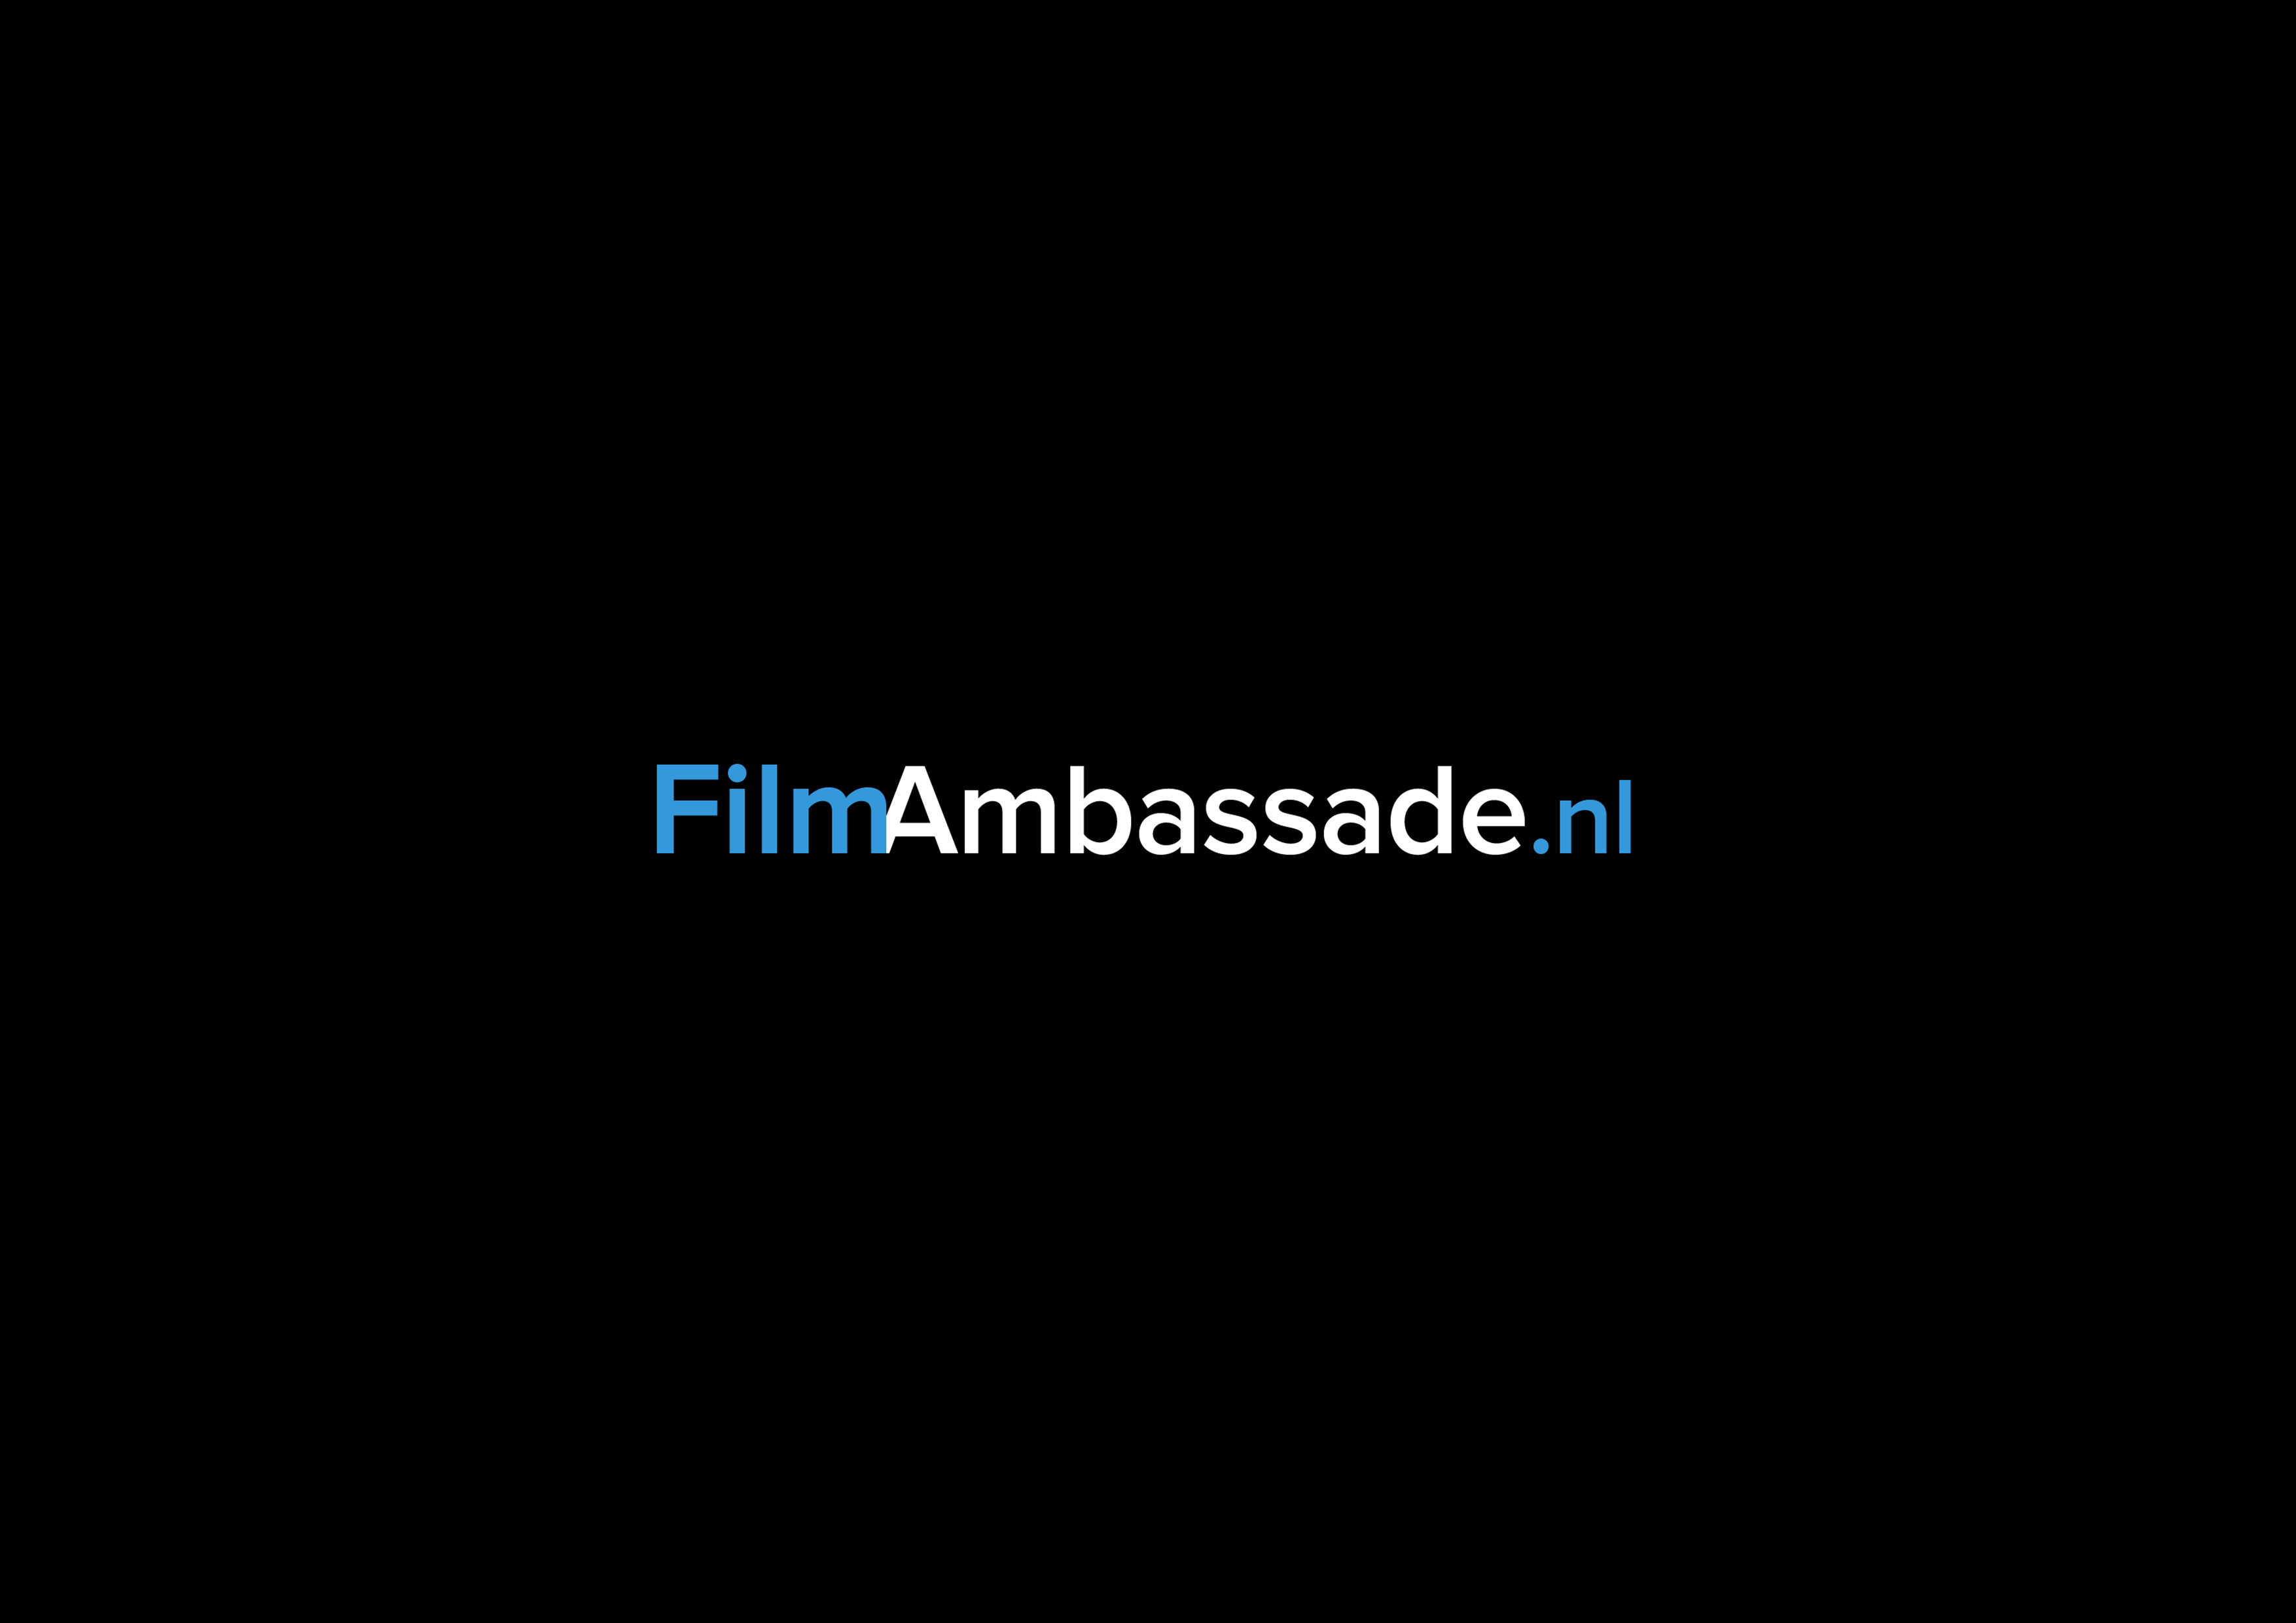 Filmambassade